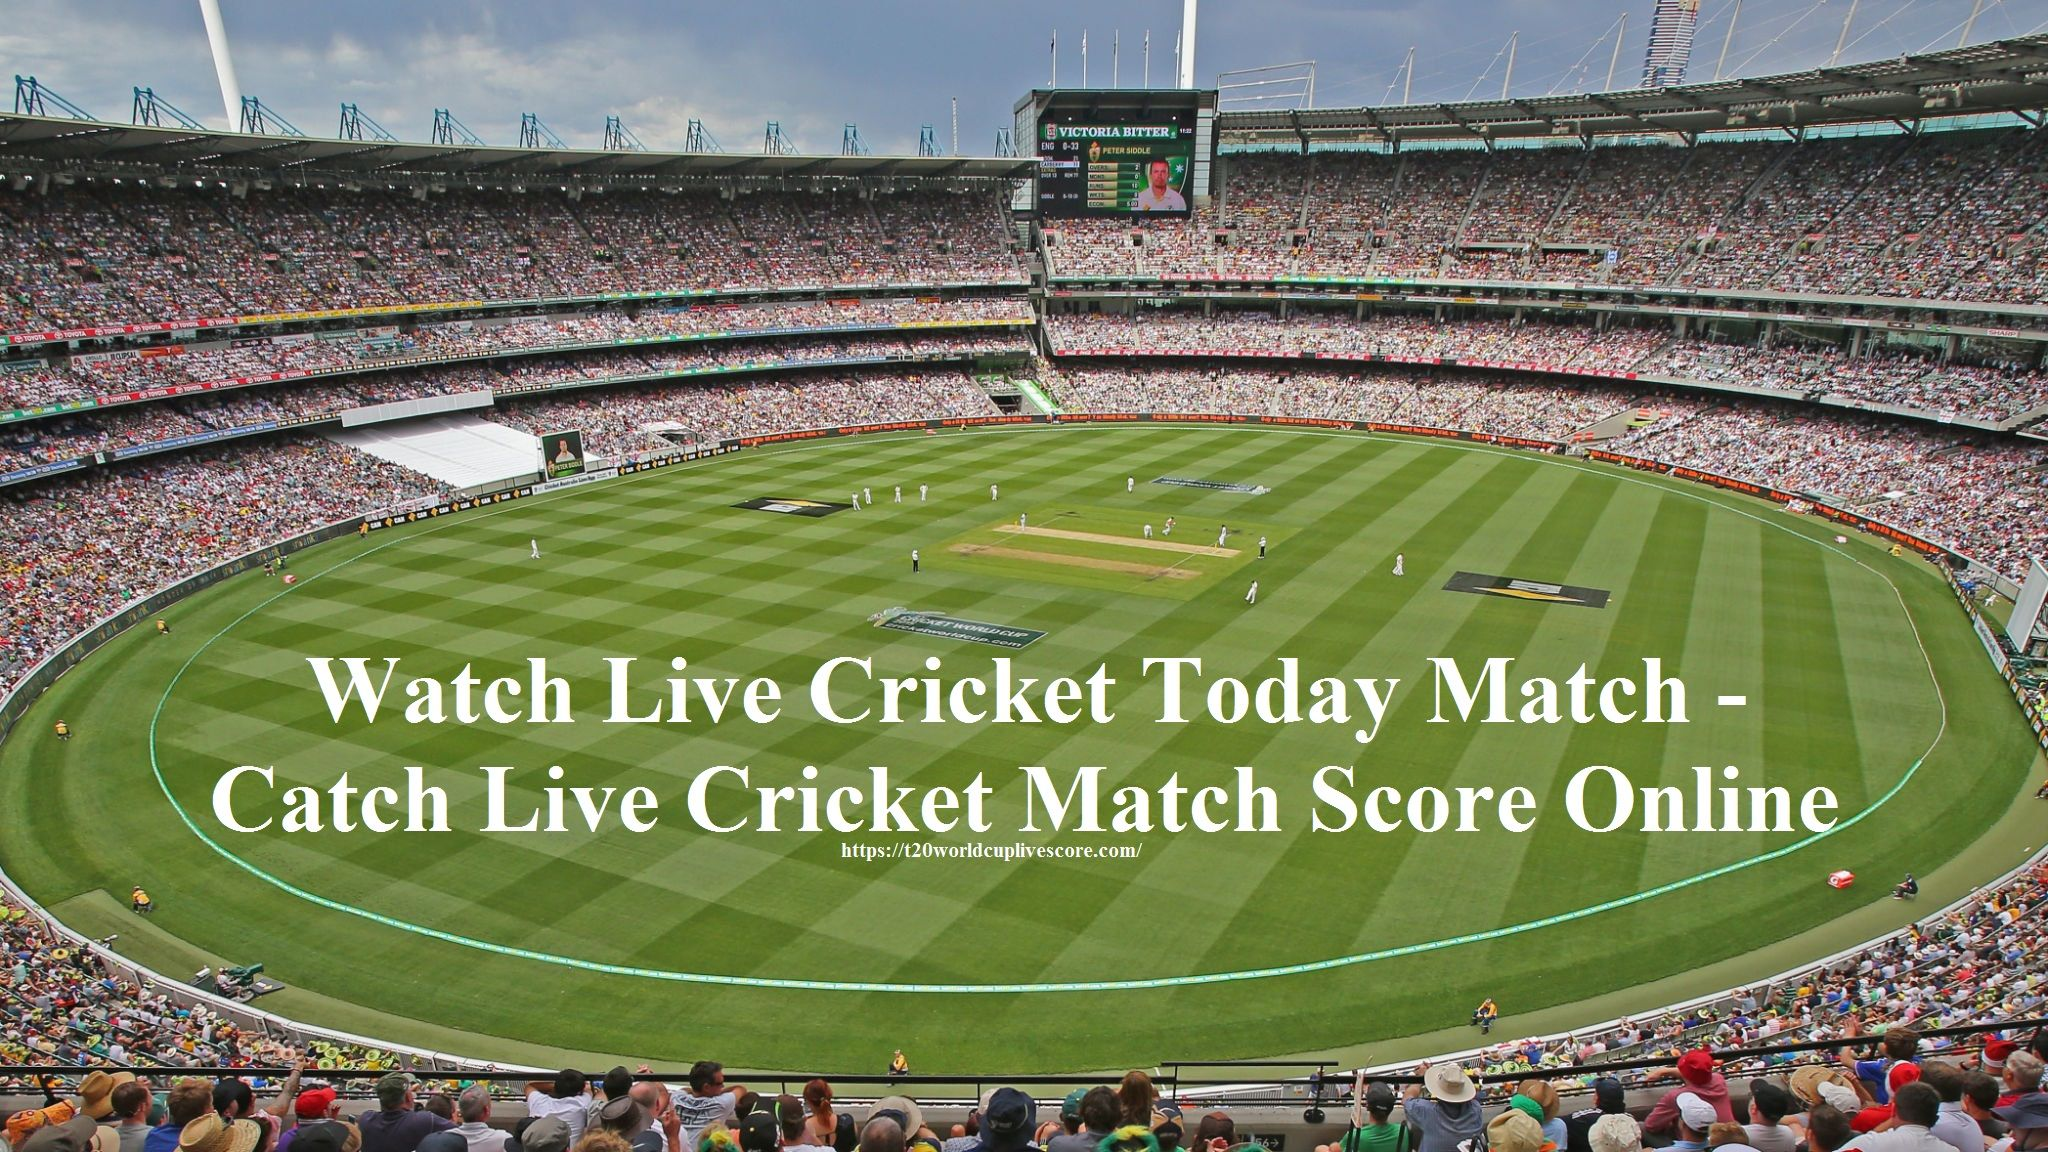 Watch Live Cricket Today Match - Catch Live Cricket Match Score Online